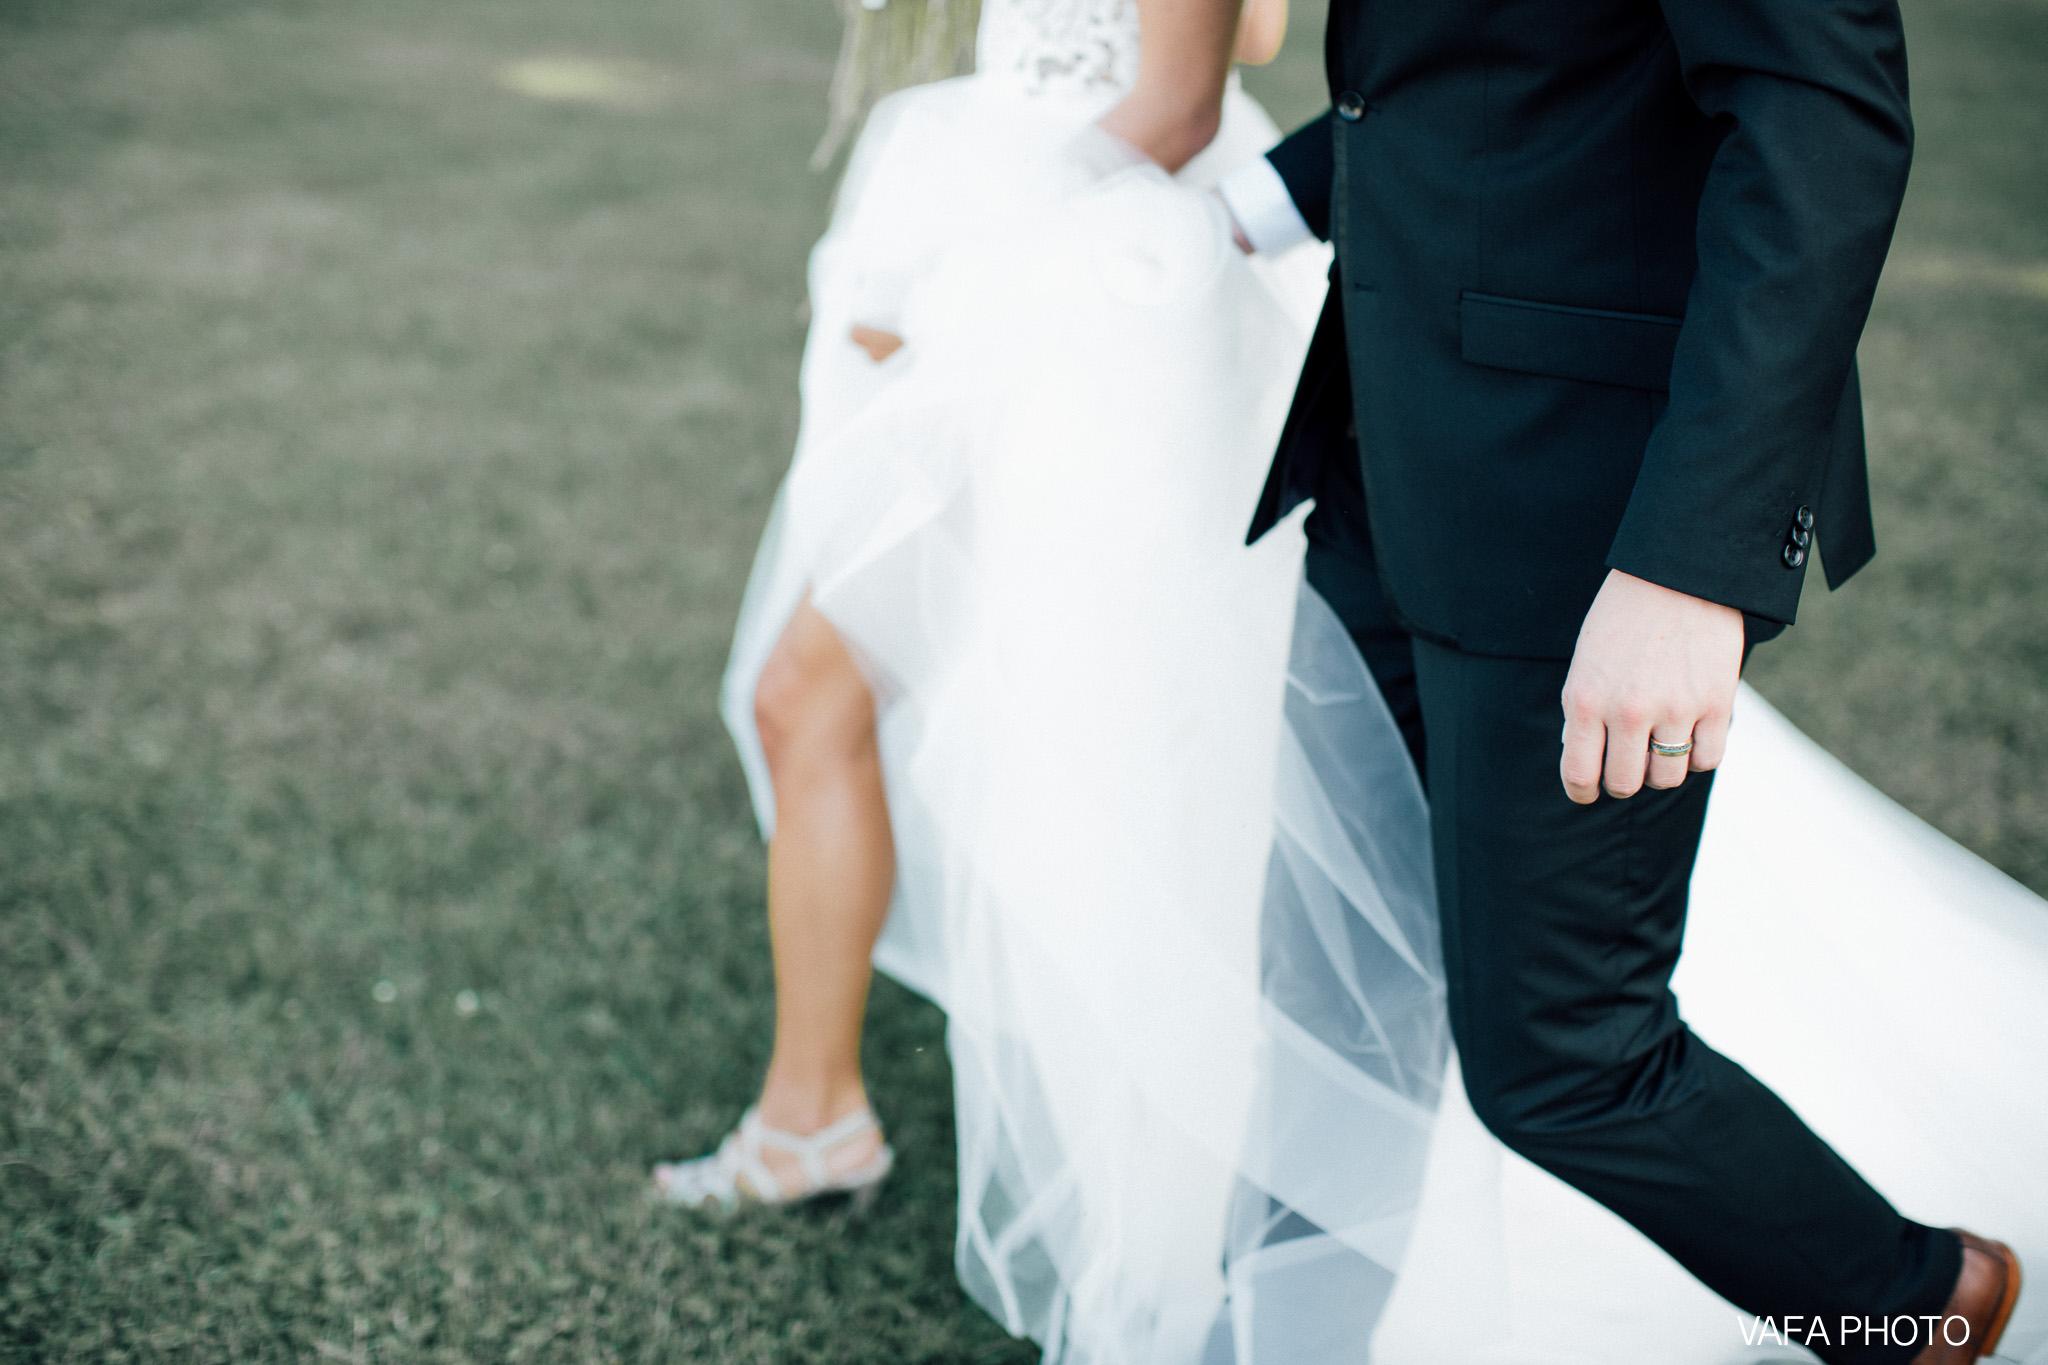 The-Felt-Estate-Wedding-Kailie-David-Vafa-Photo-590.jpg